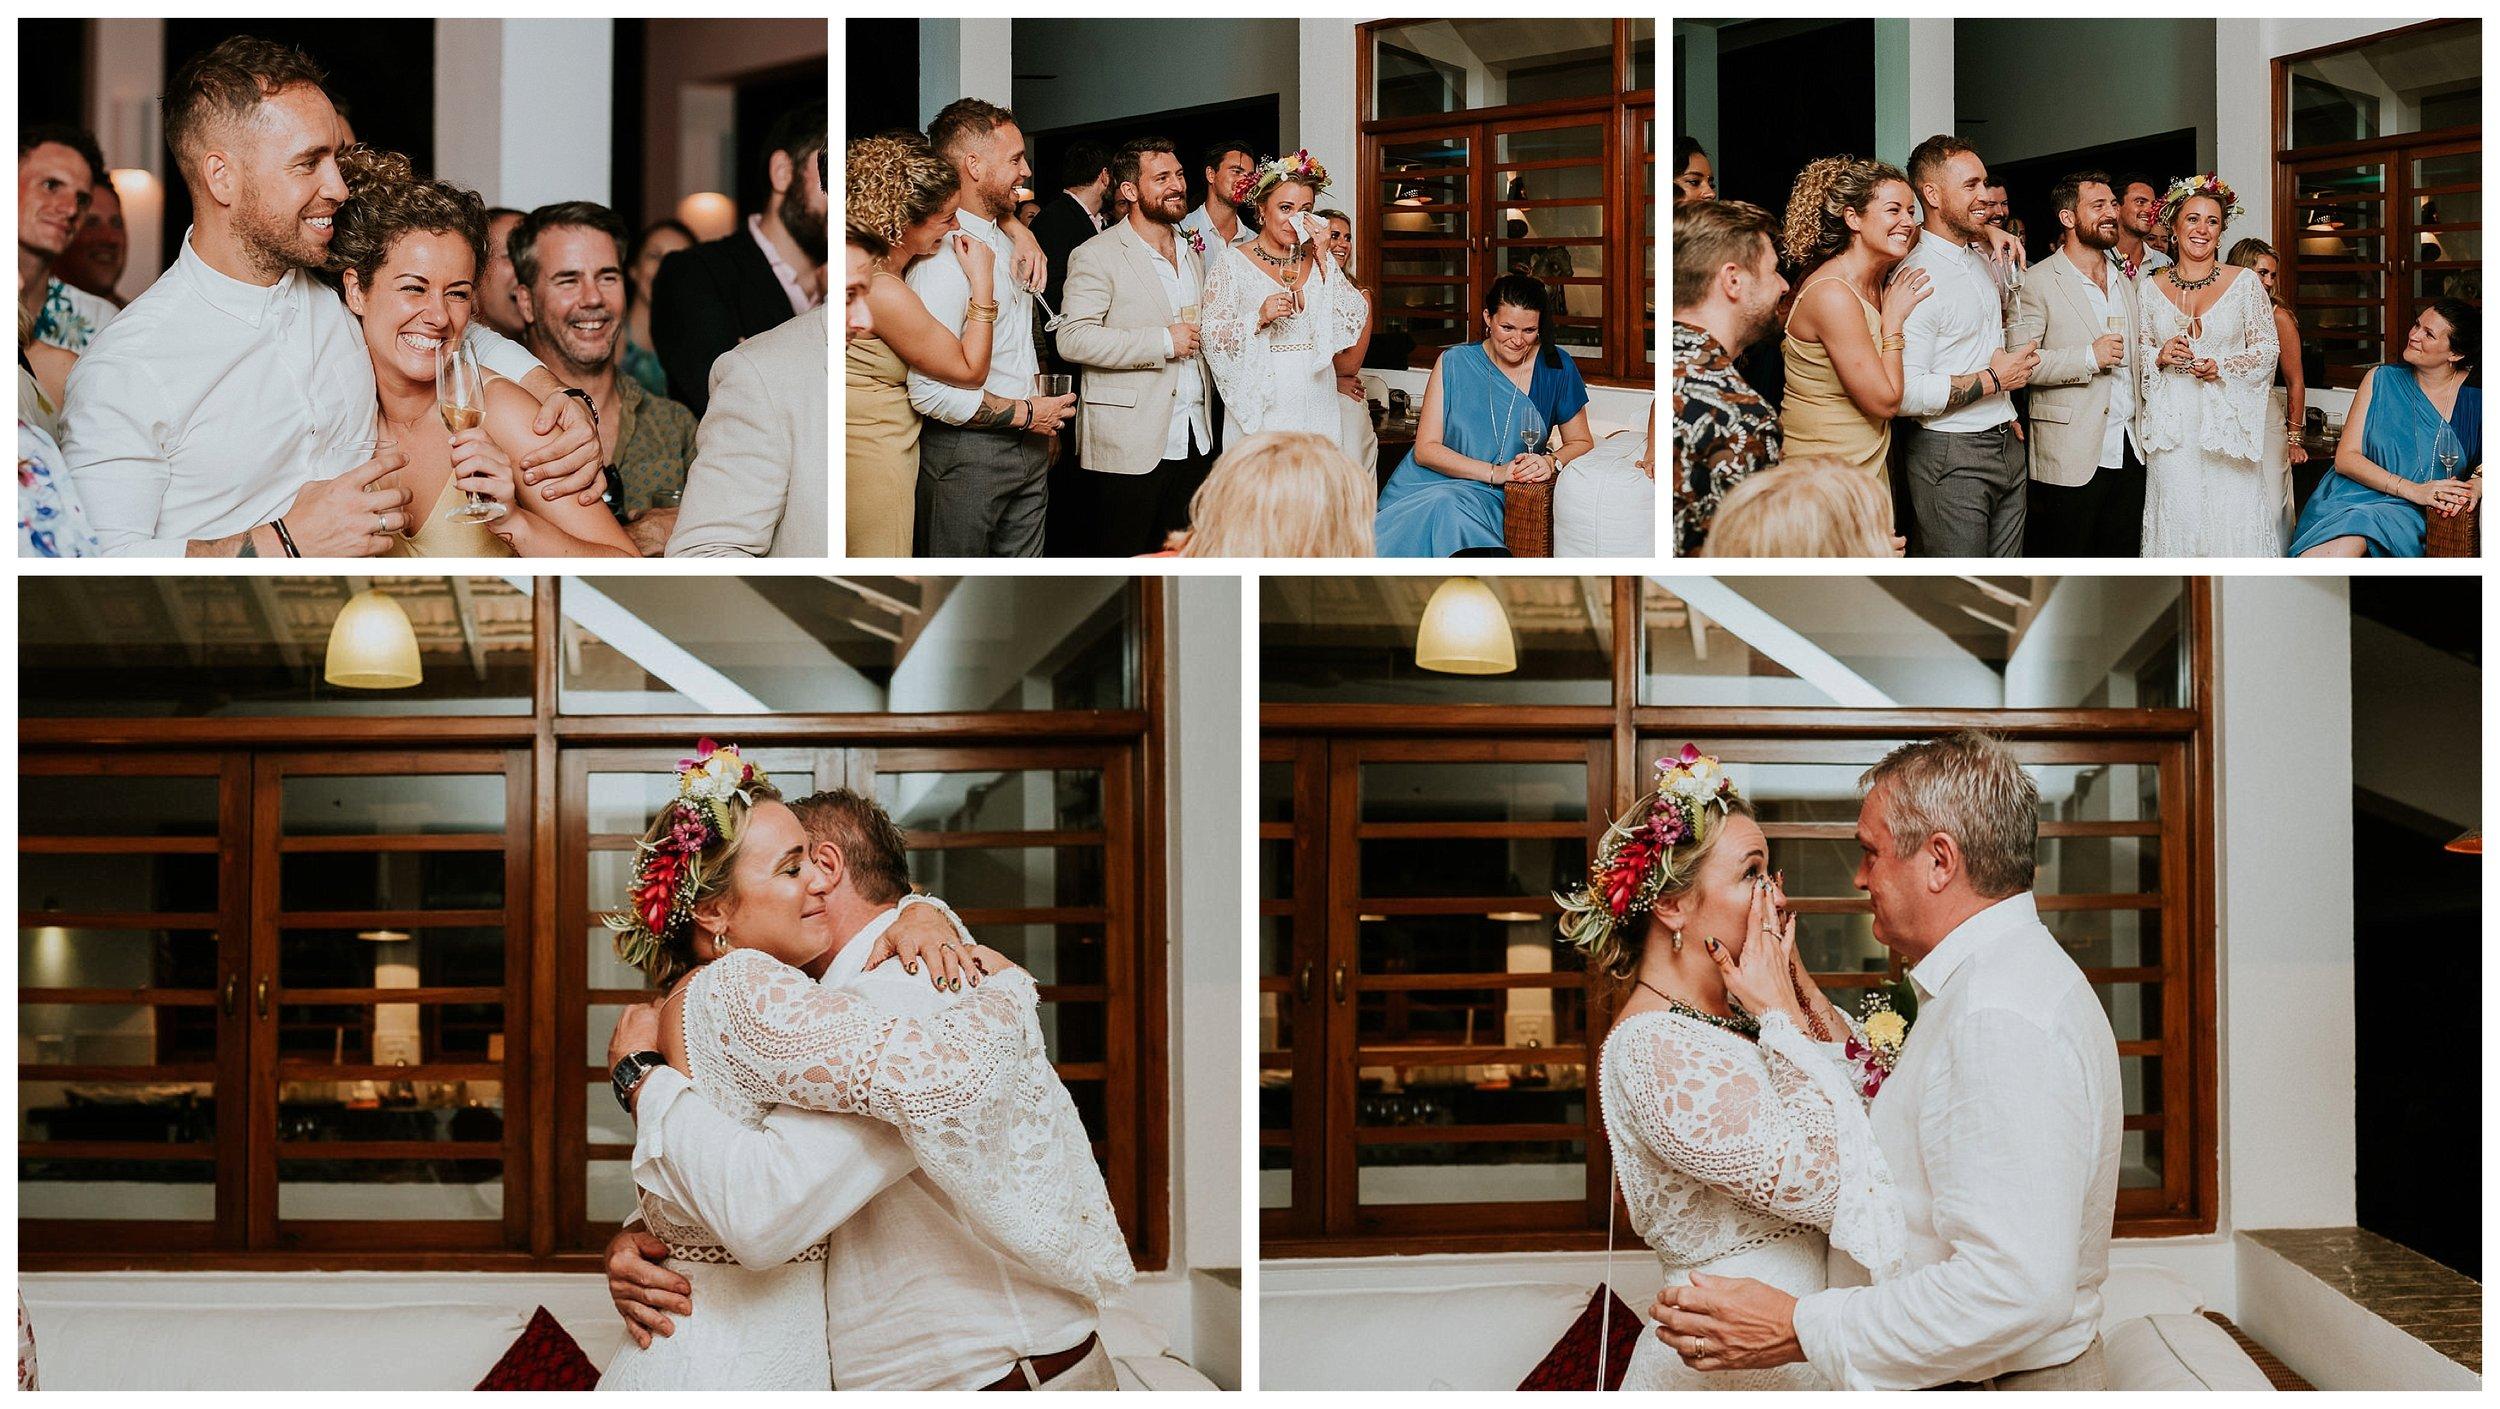 Goa Destination Wedding Photographer India Colouful Fun Joanna Nicole Photography Coco Shambhala23.jpg